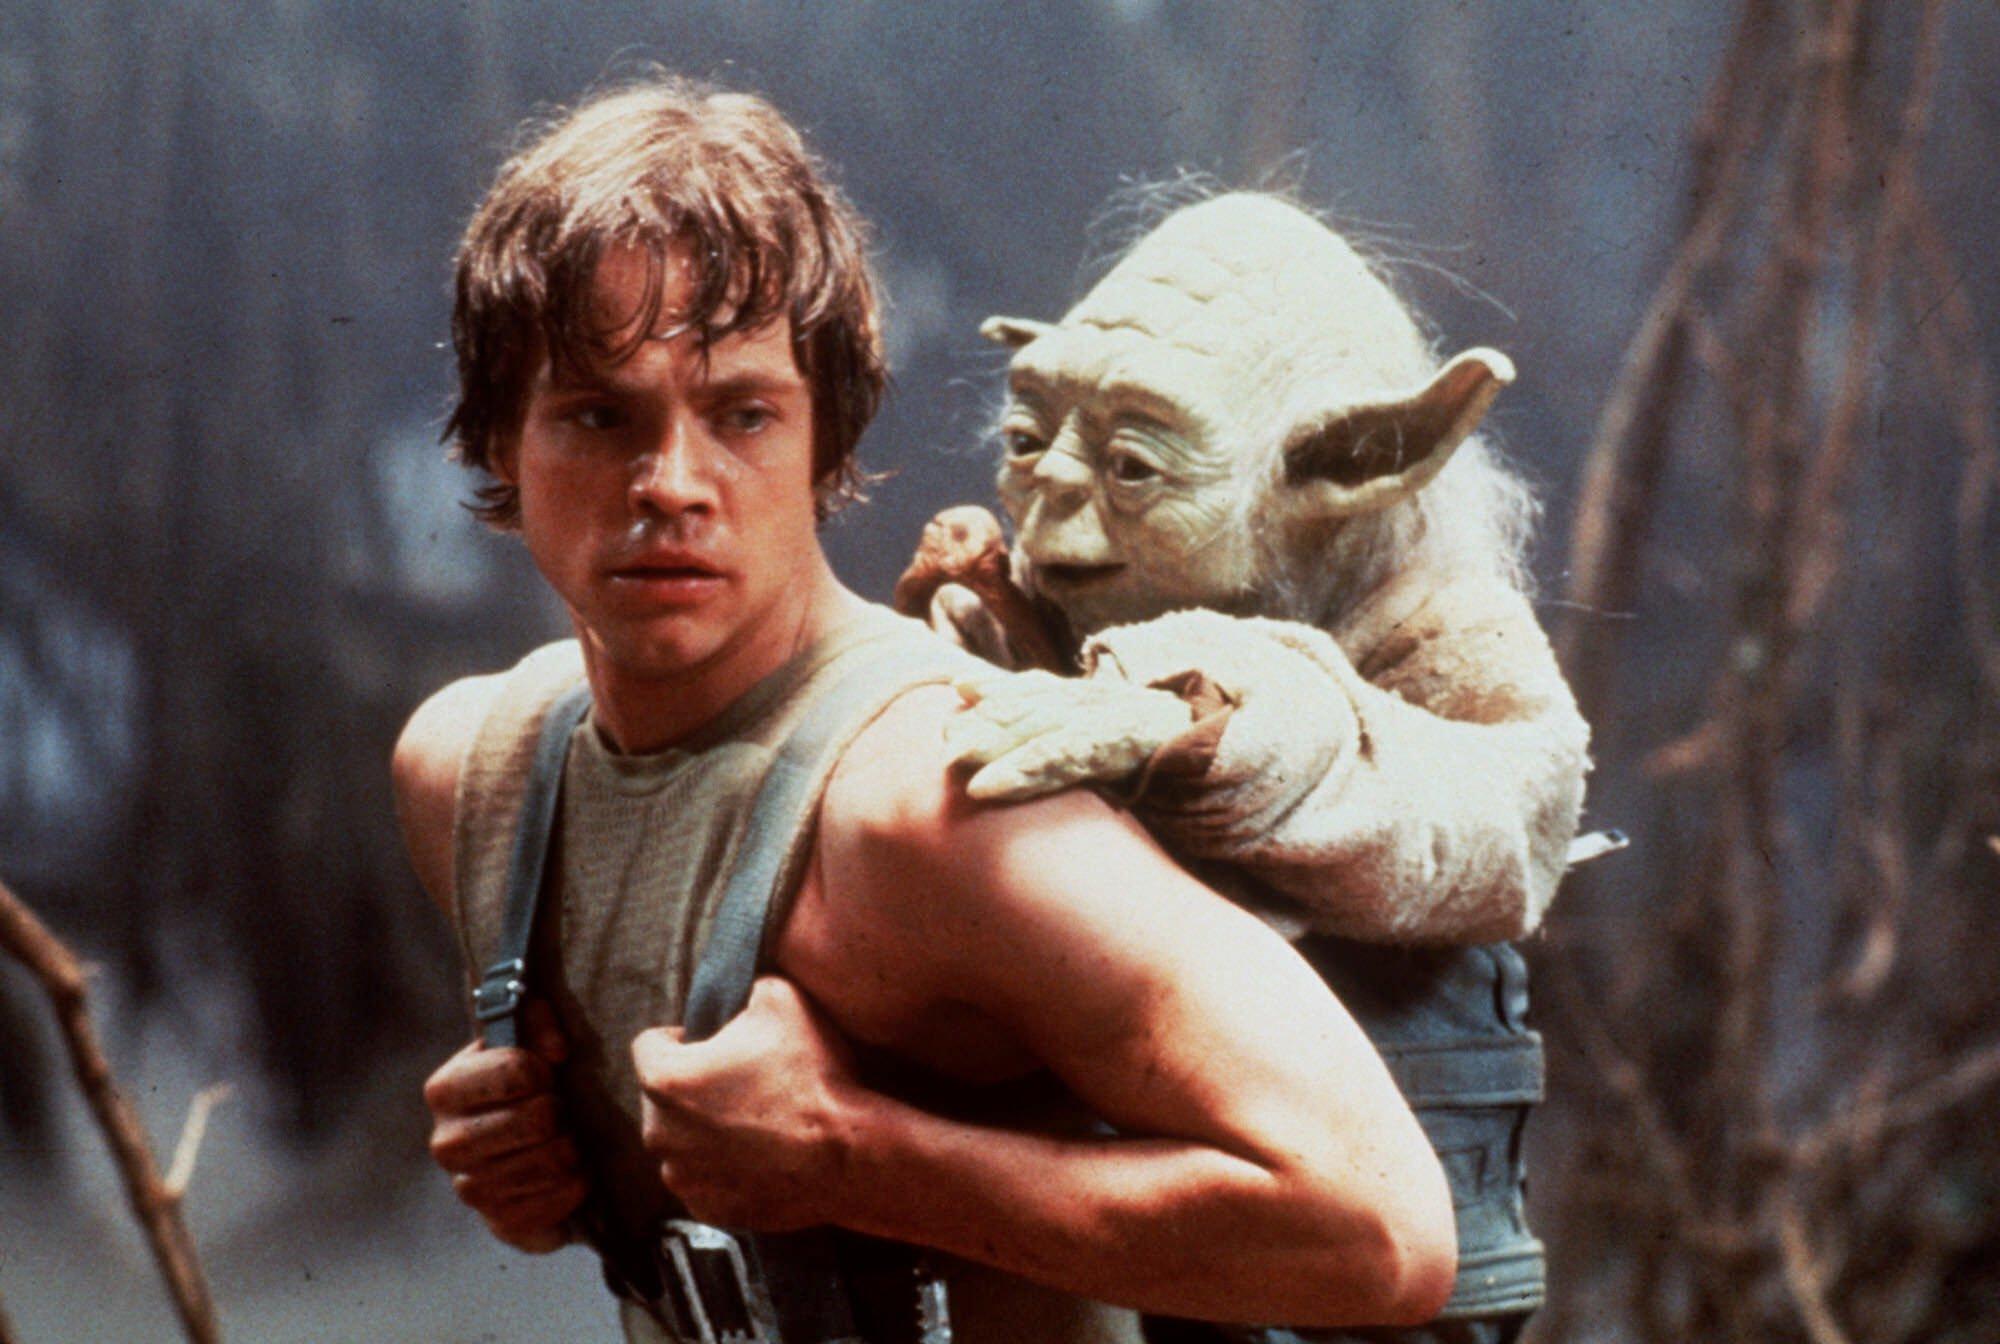 Le Maître Yoda entraîne Luke pour la fin de son apprentissage.